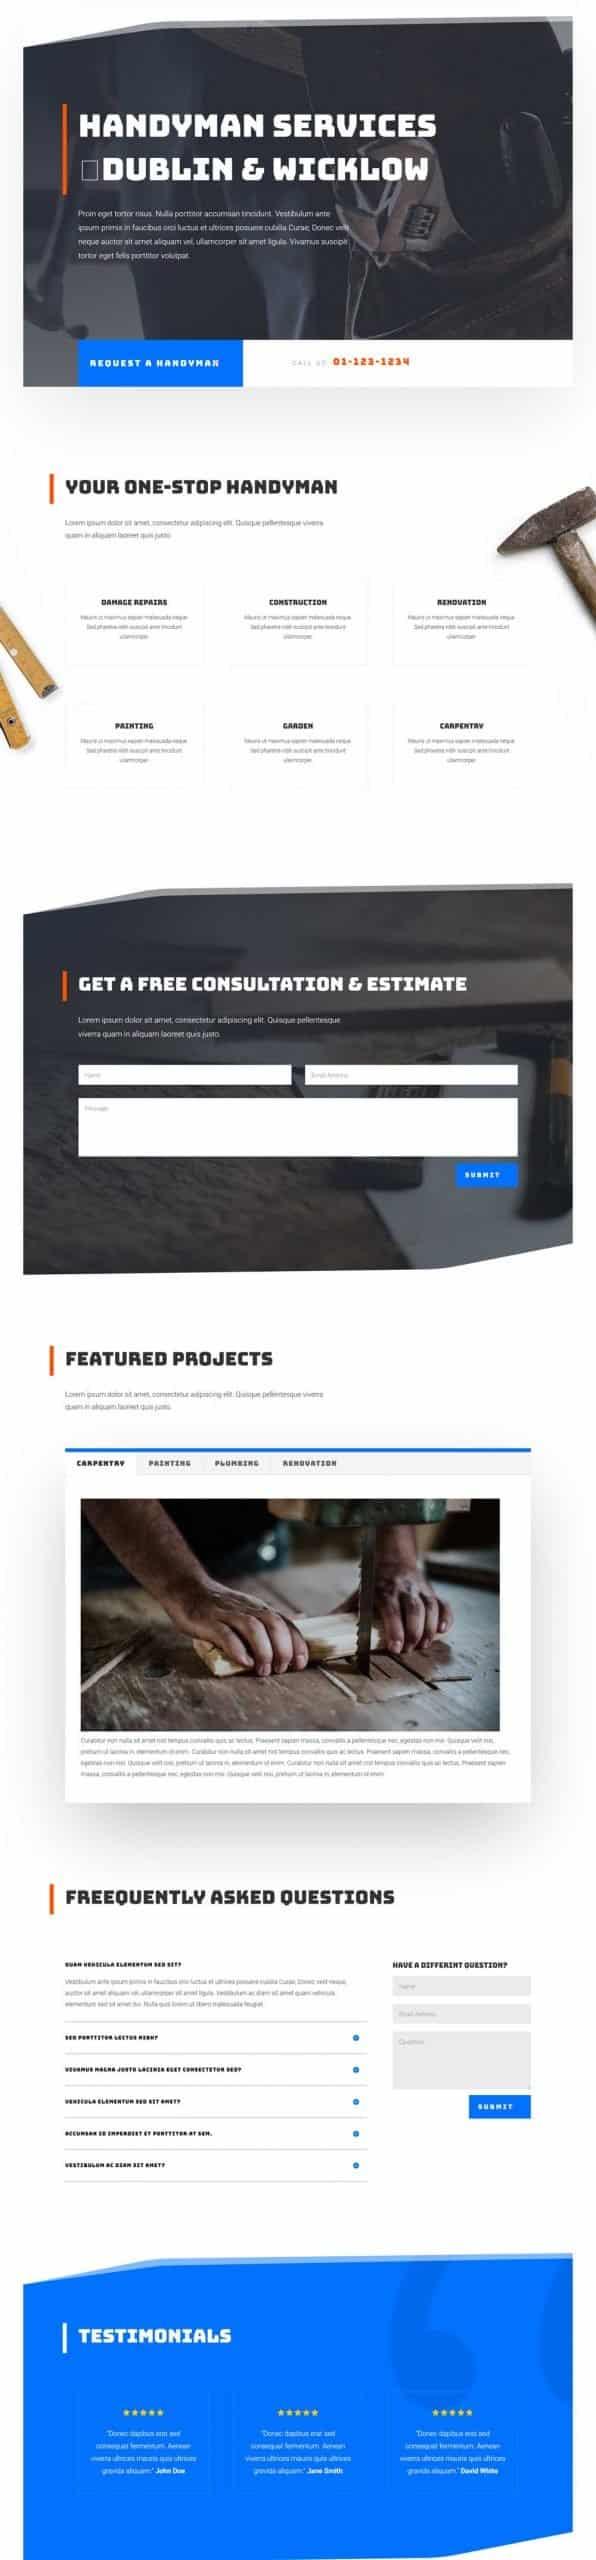 Screenshot of the Handyman Layout